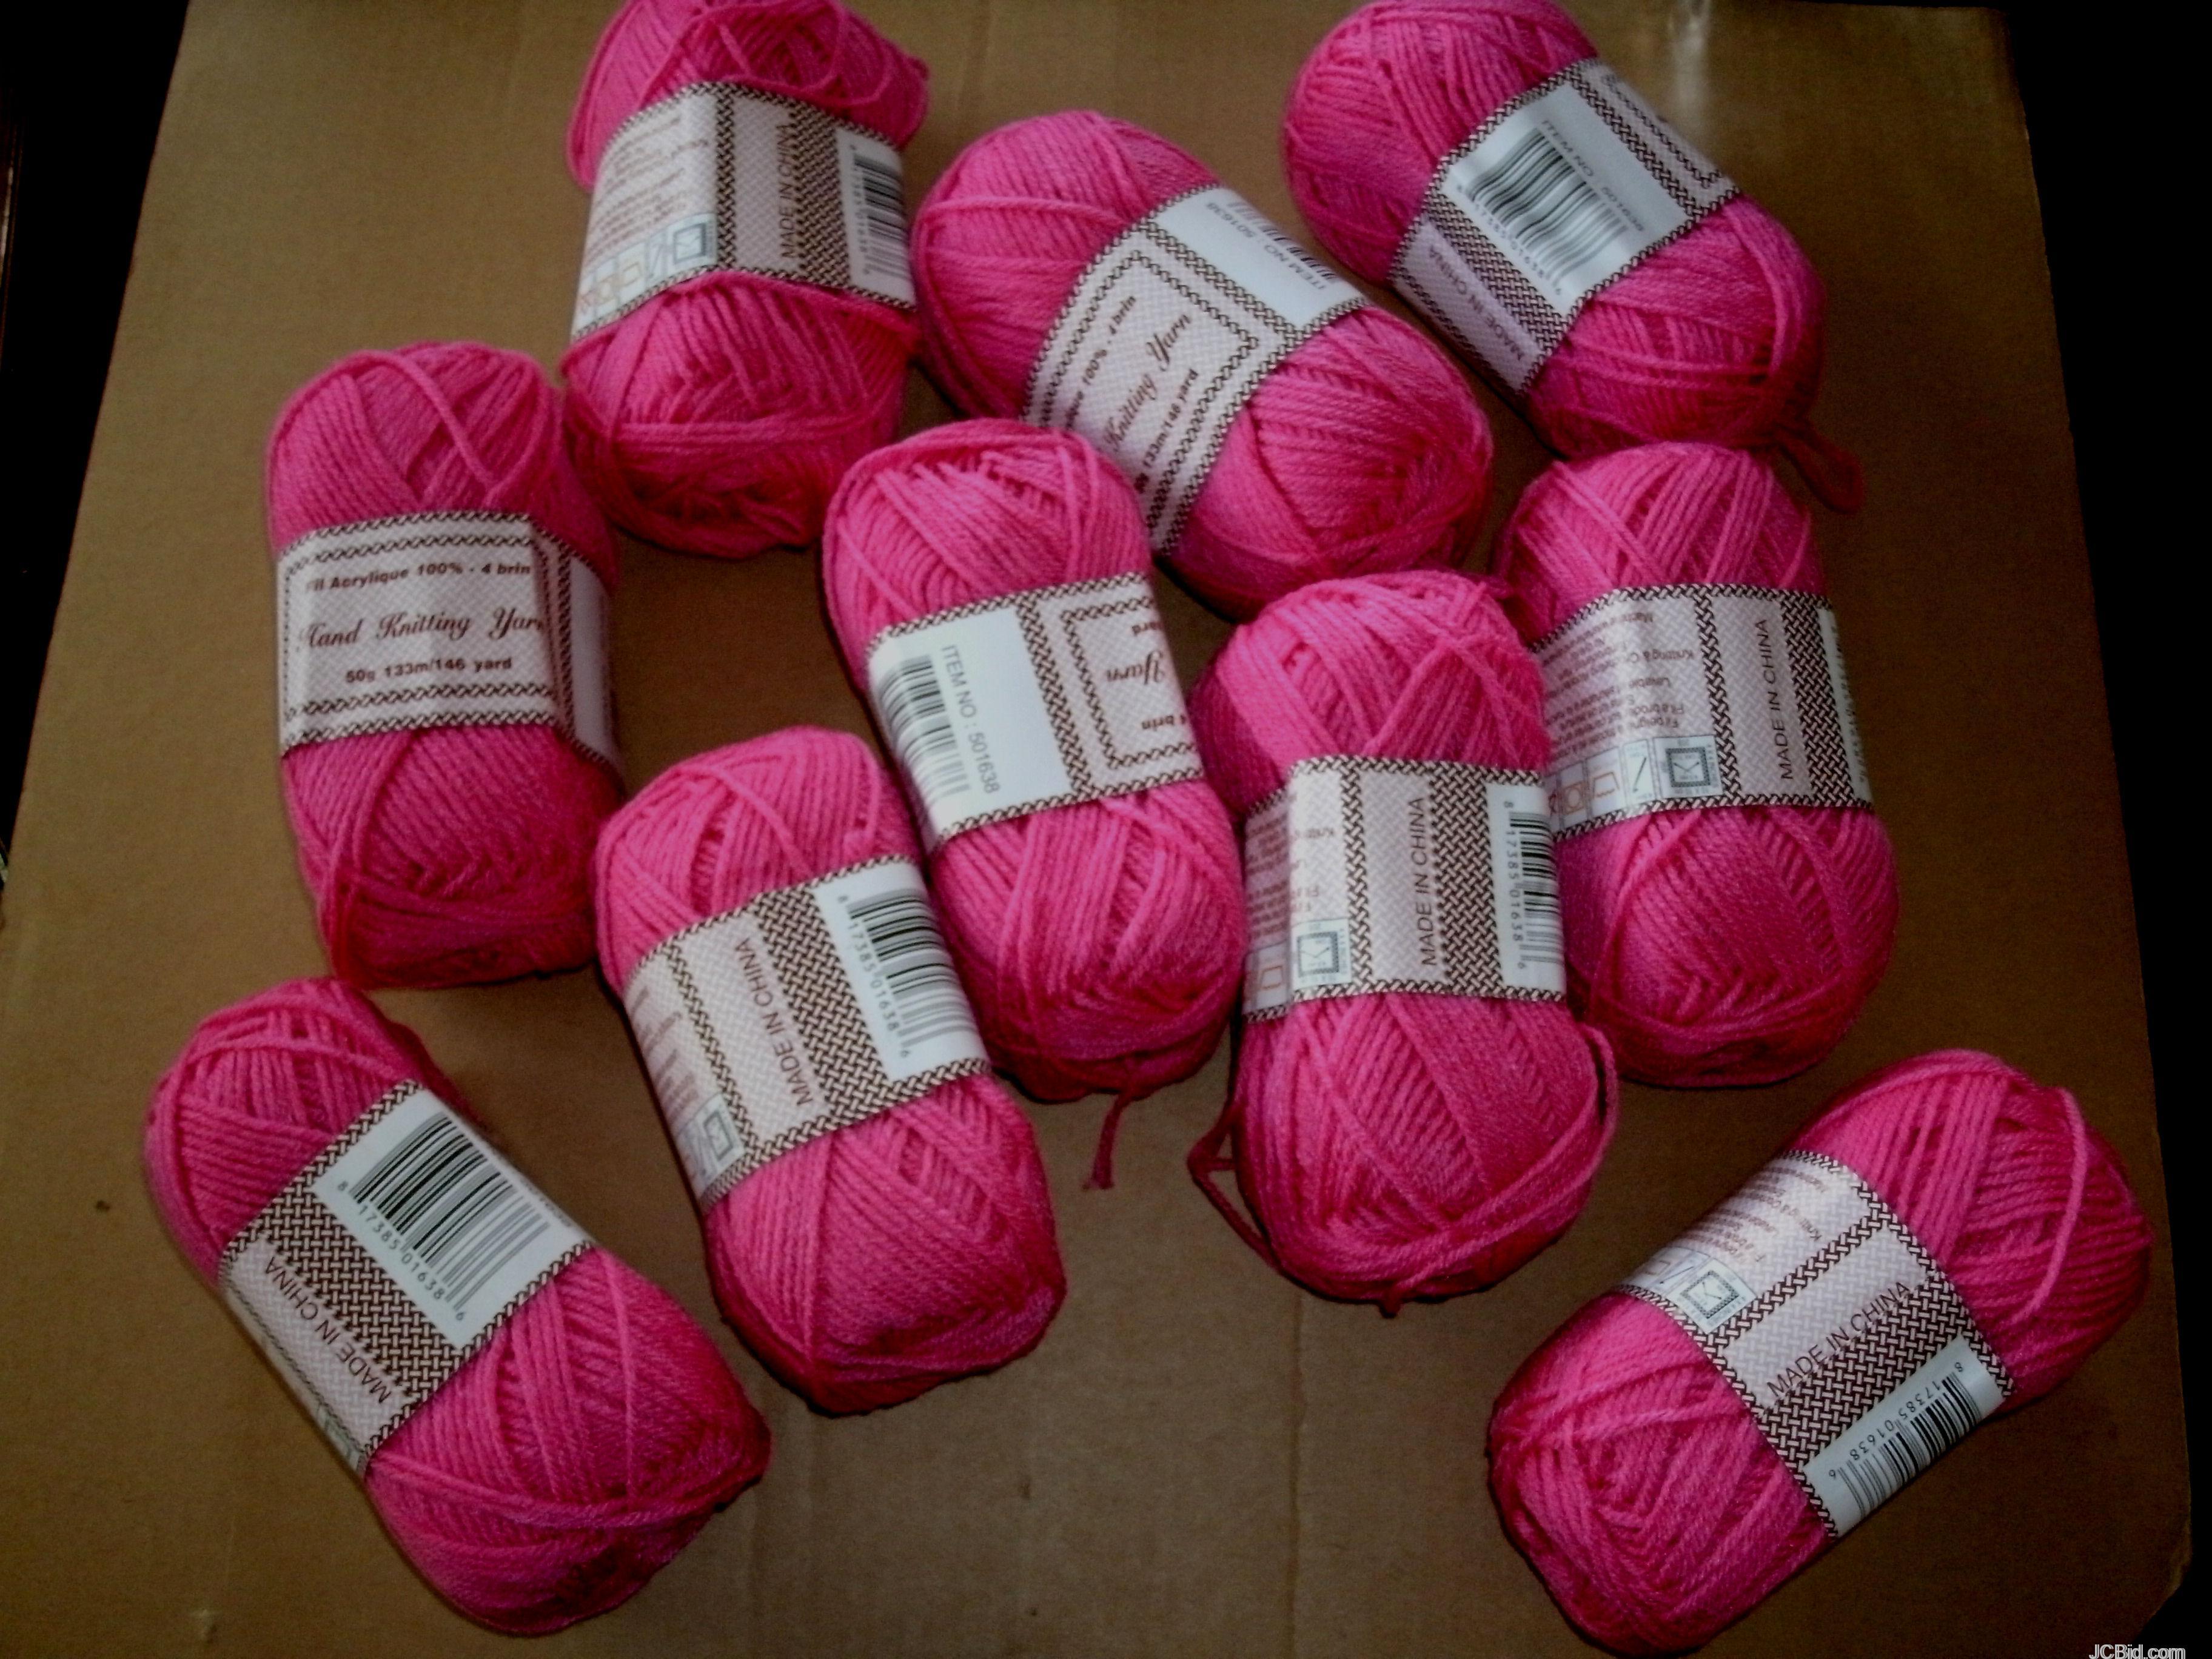 JCBid.com Hand-knitting-Crochet-yarn-50g-Each-Just-15-each-Ball-Rose